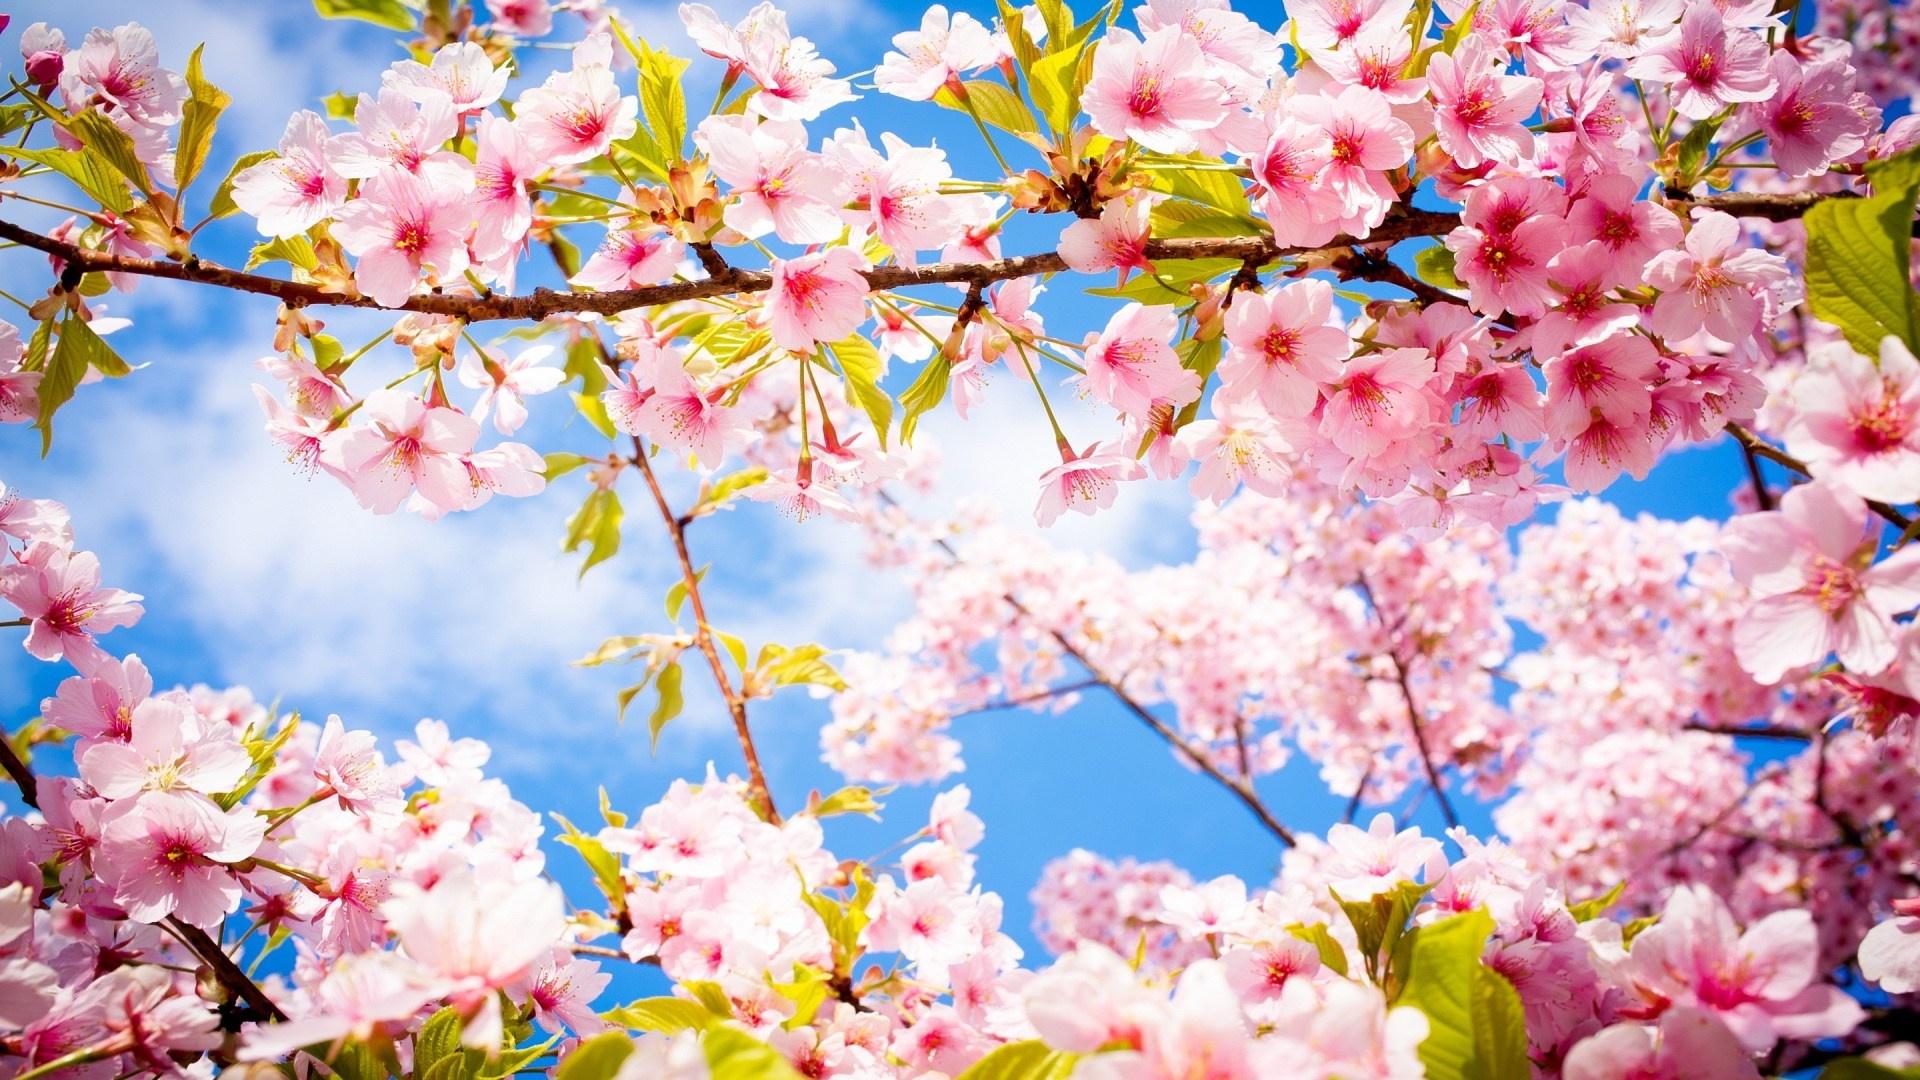 Springtime hd wallpaper download